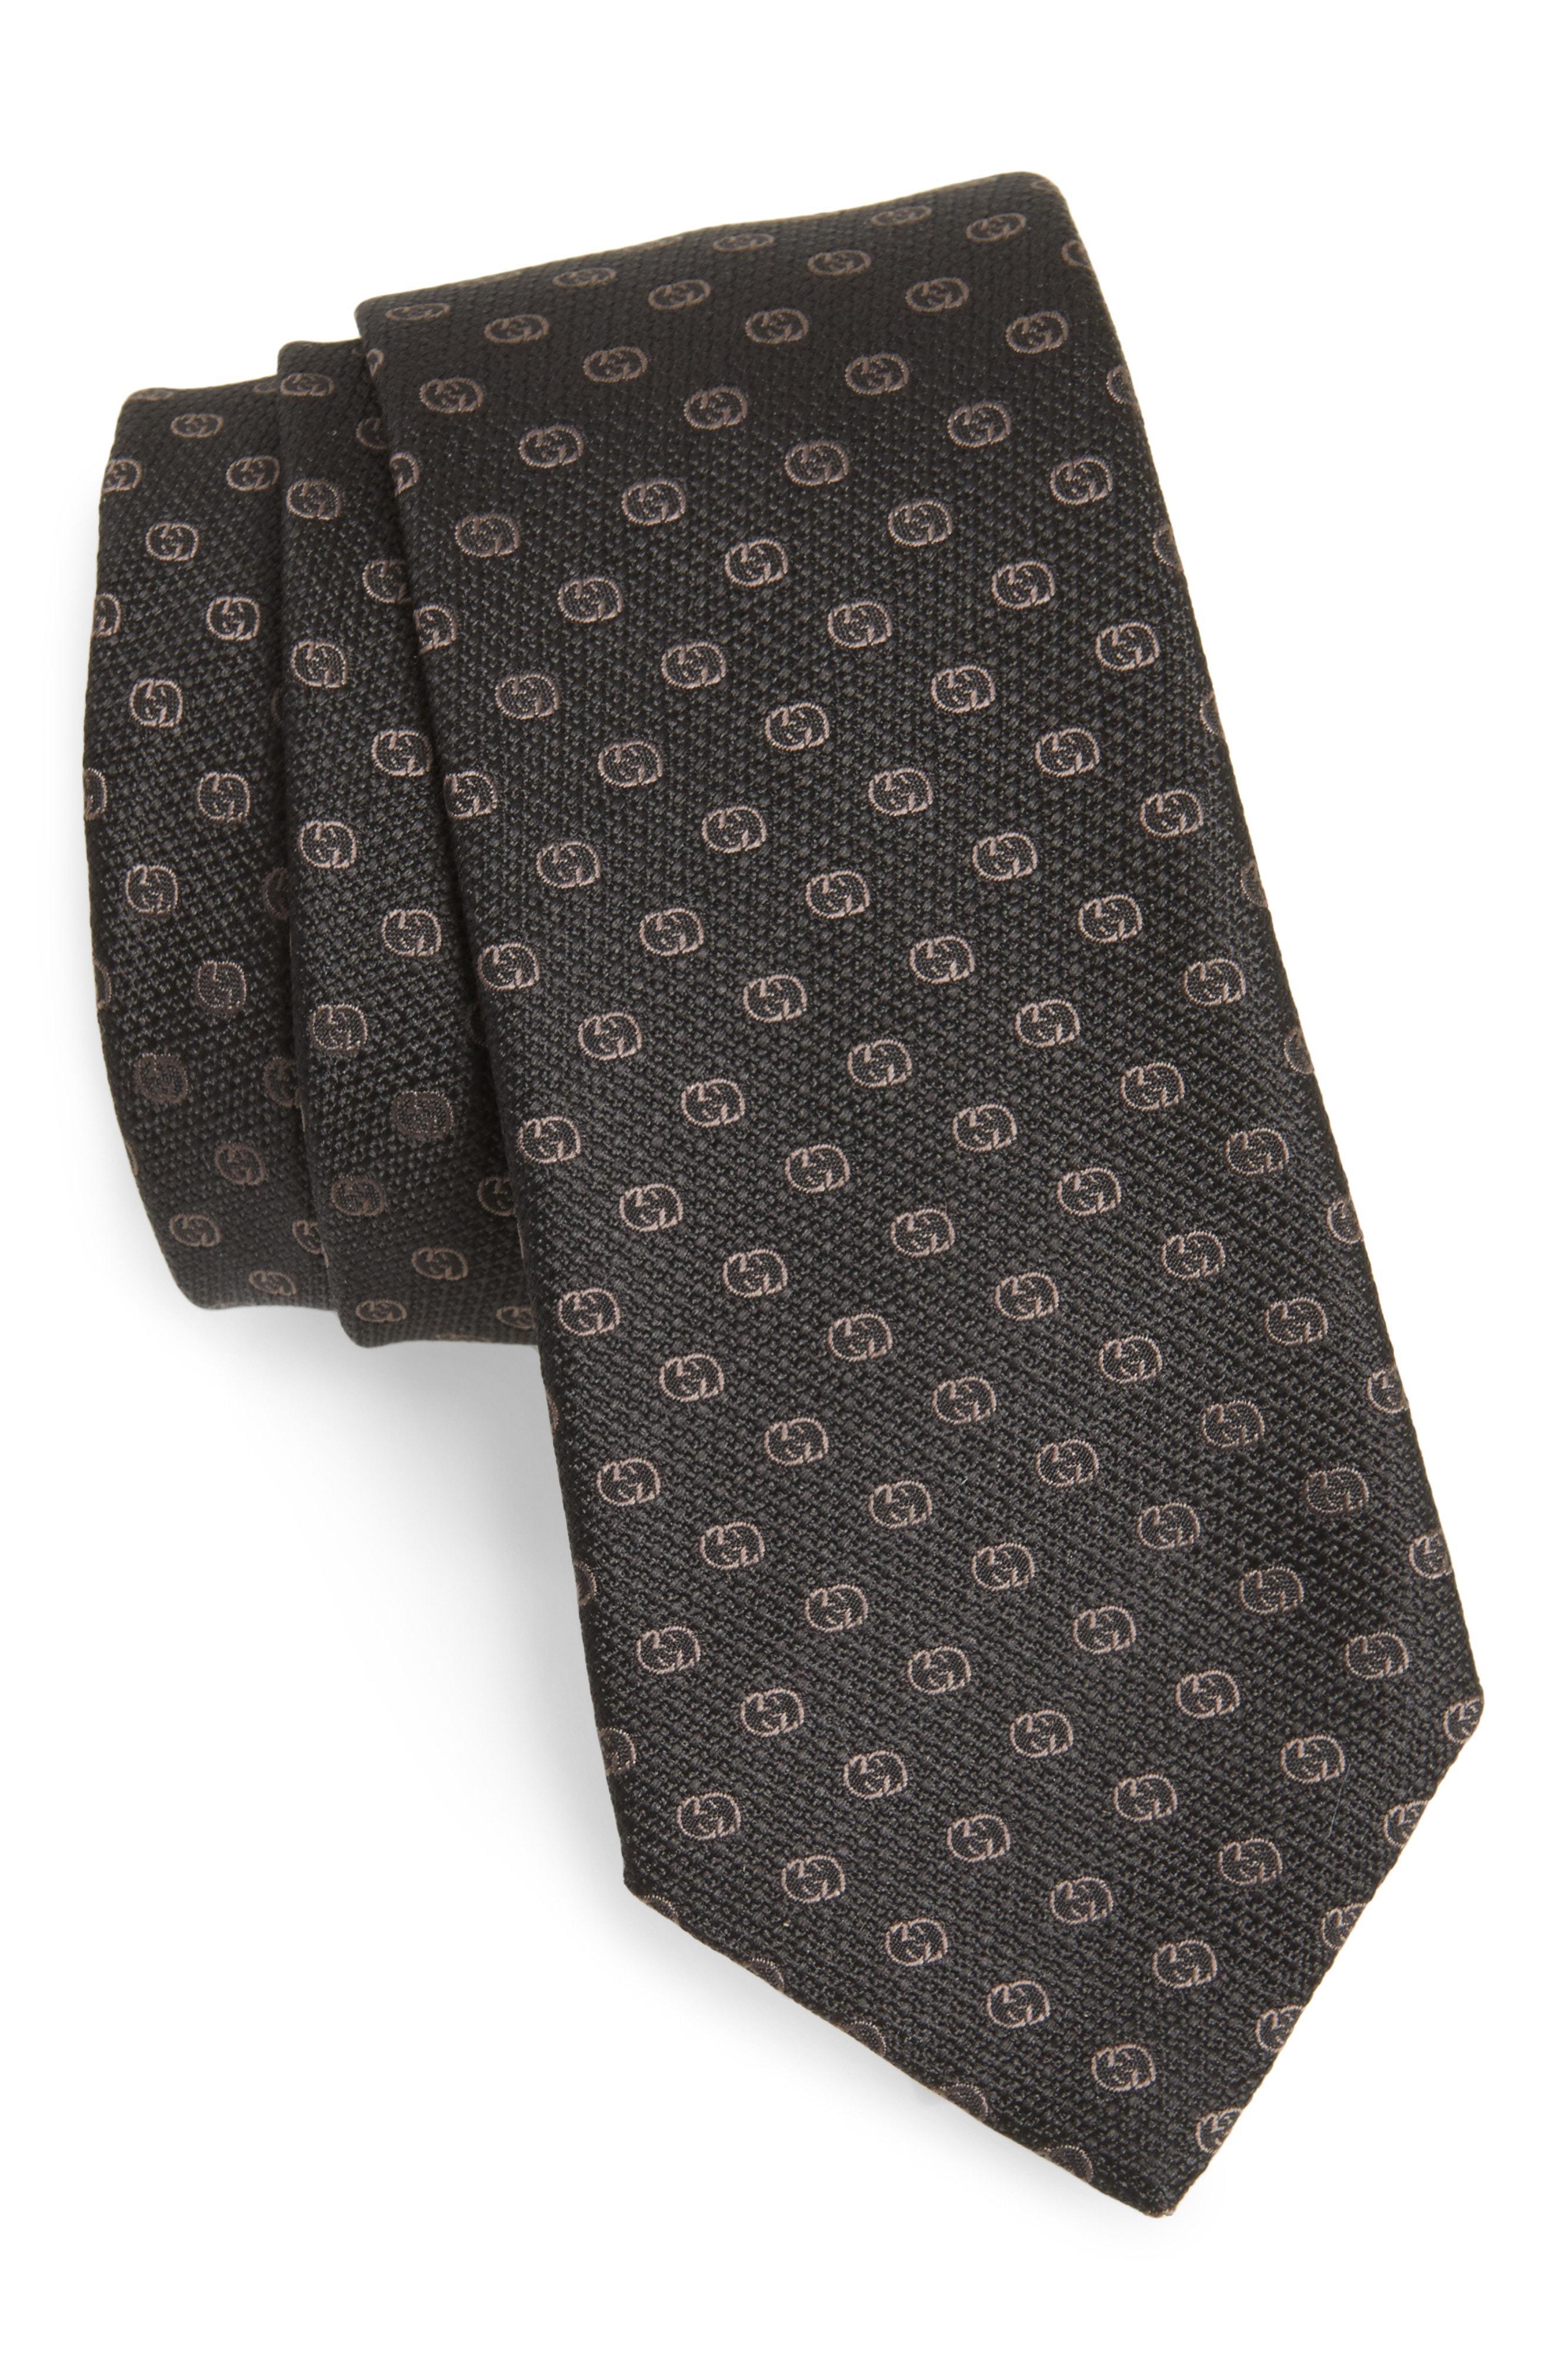 7ede6805665 Lyst - Gucci Gg Tinev Silk Jacquard Tie in Gray for Men